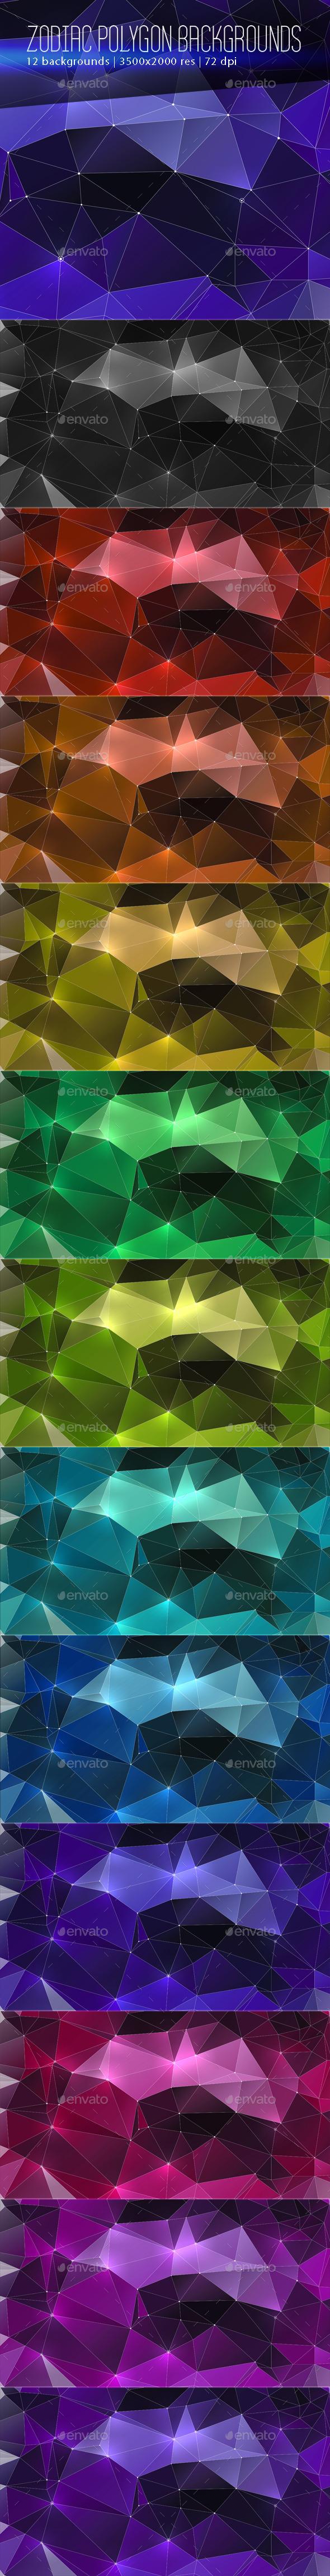 Zodiac Polygon Backgrounds